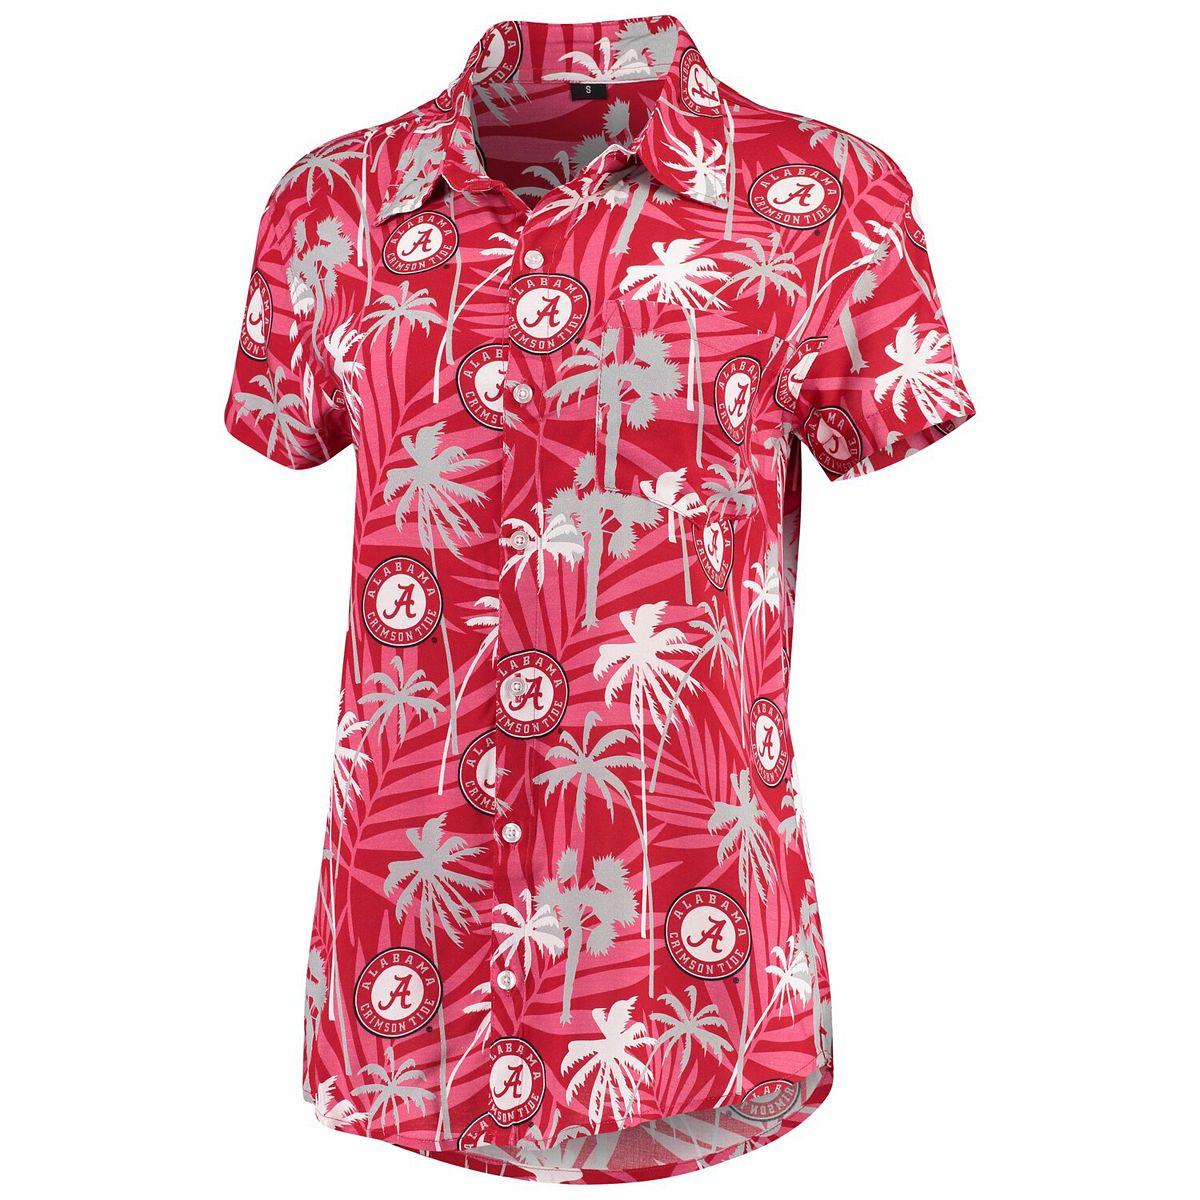 Women's Crimson Alabama Crimson Tide Floral Harmonic Button-Up Shirt nhfUH